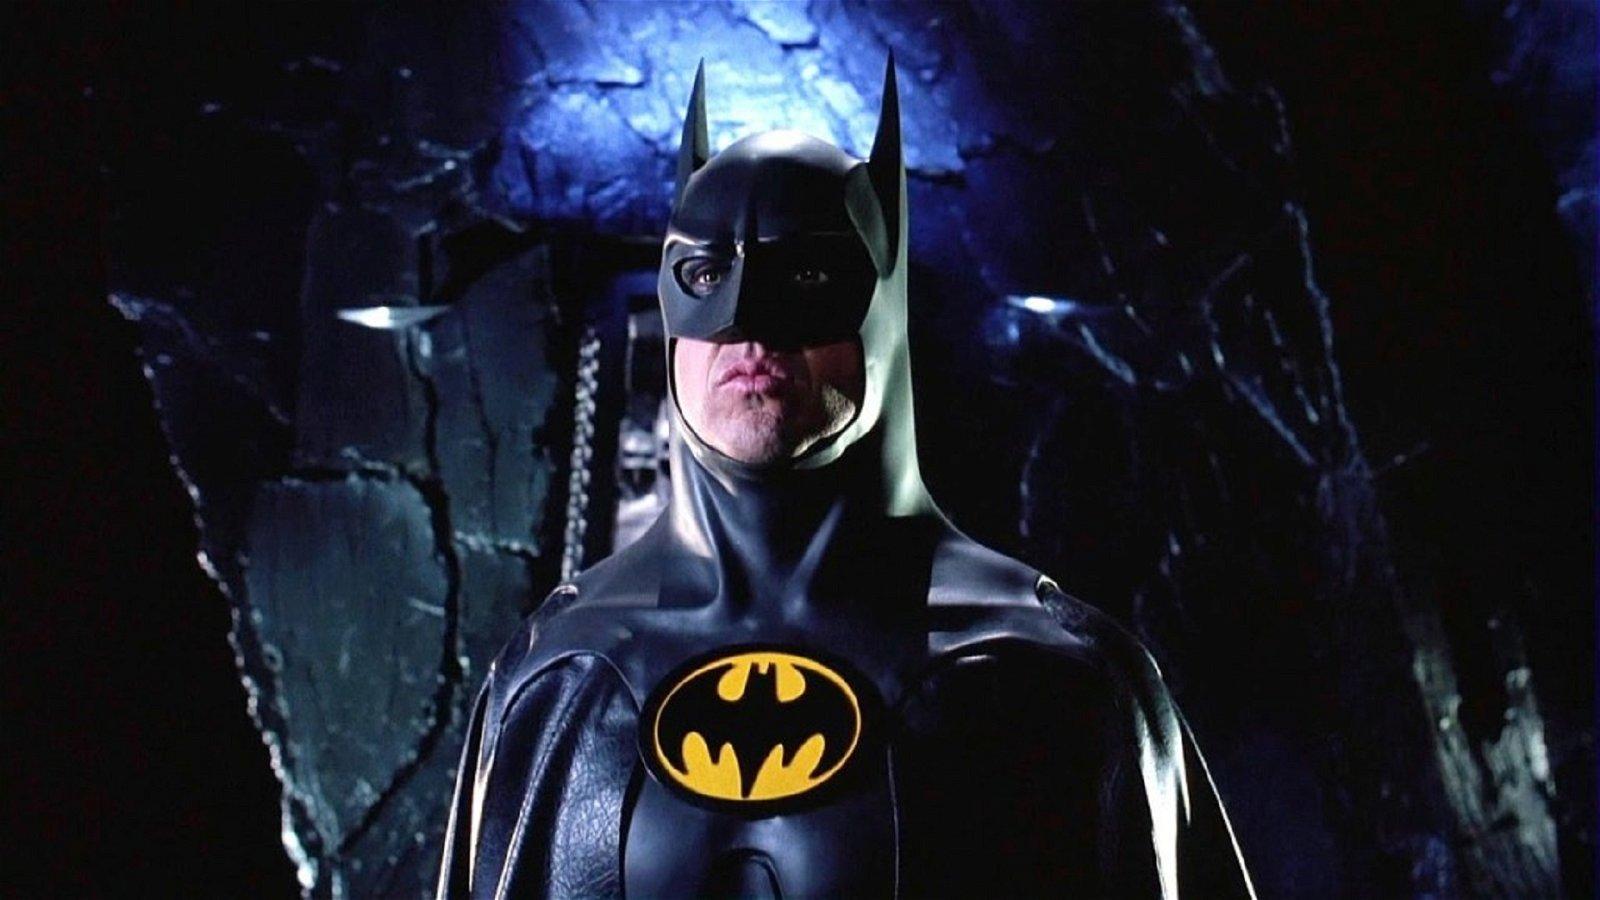 The Flash Set Photos Leak To Reveal Michael Keaton Batman's Wayne Manor